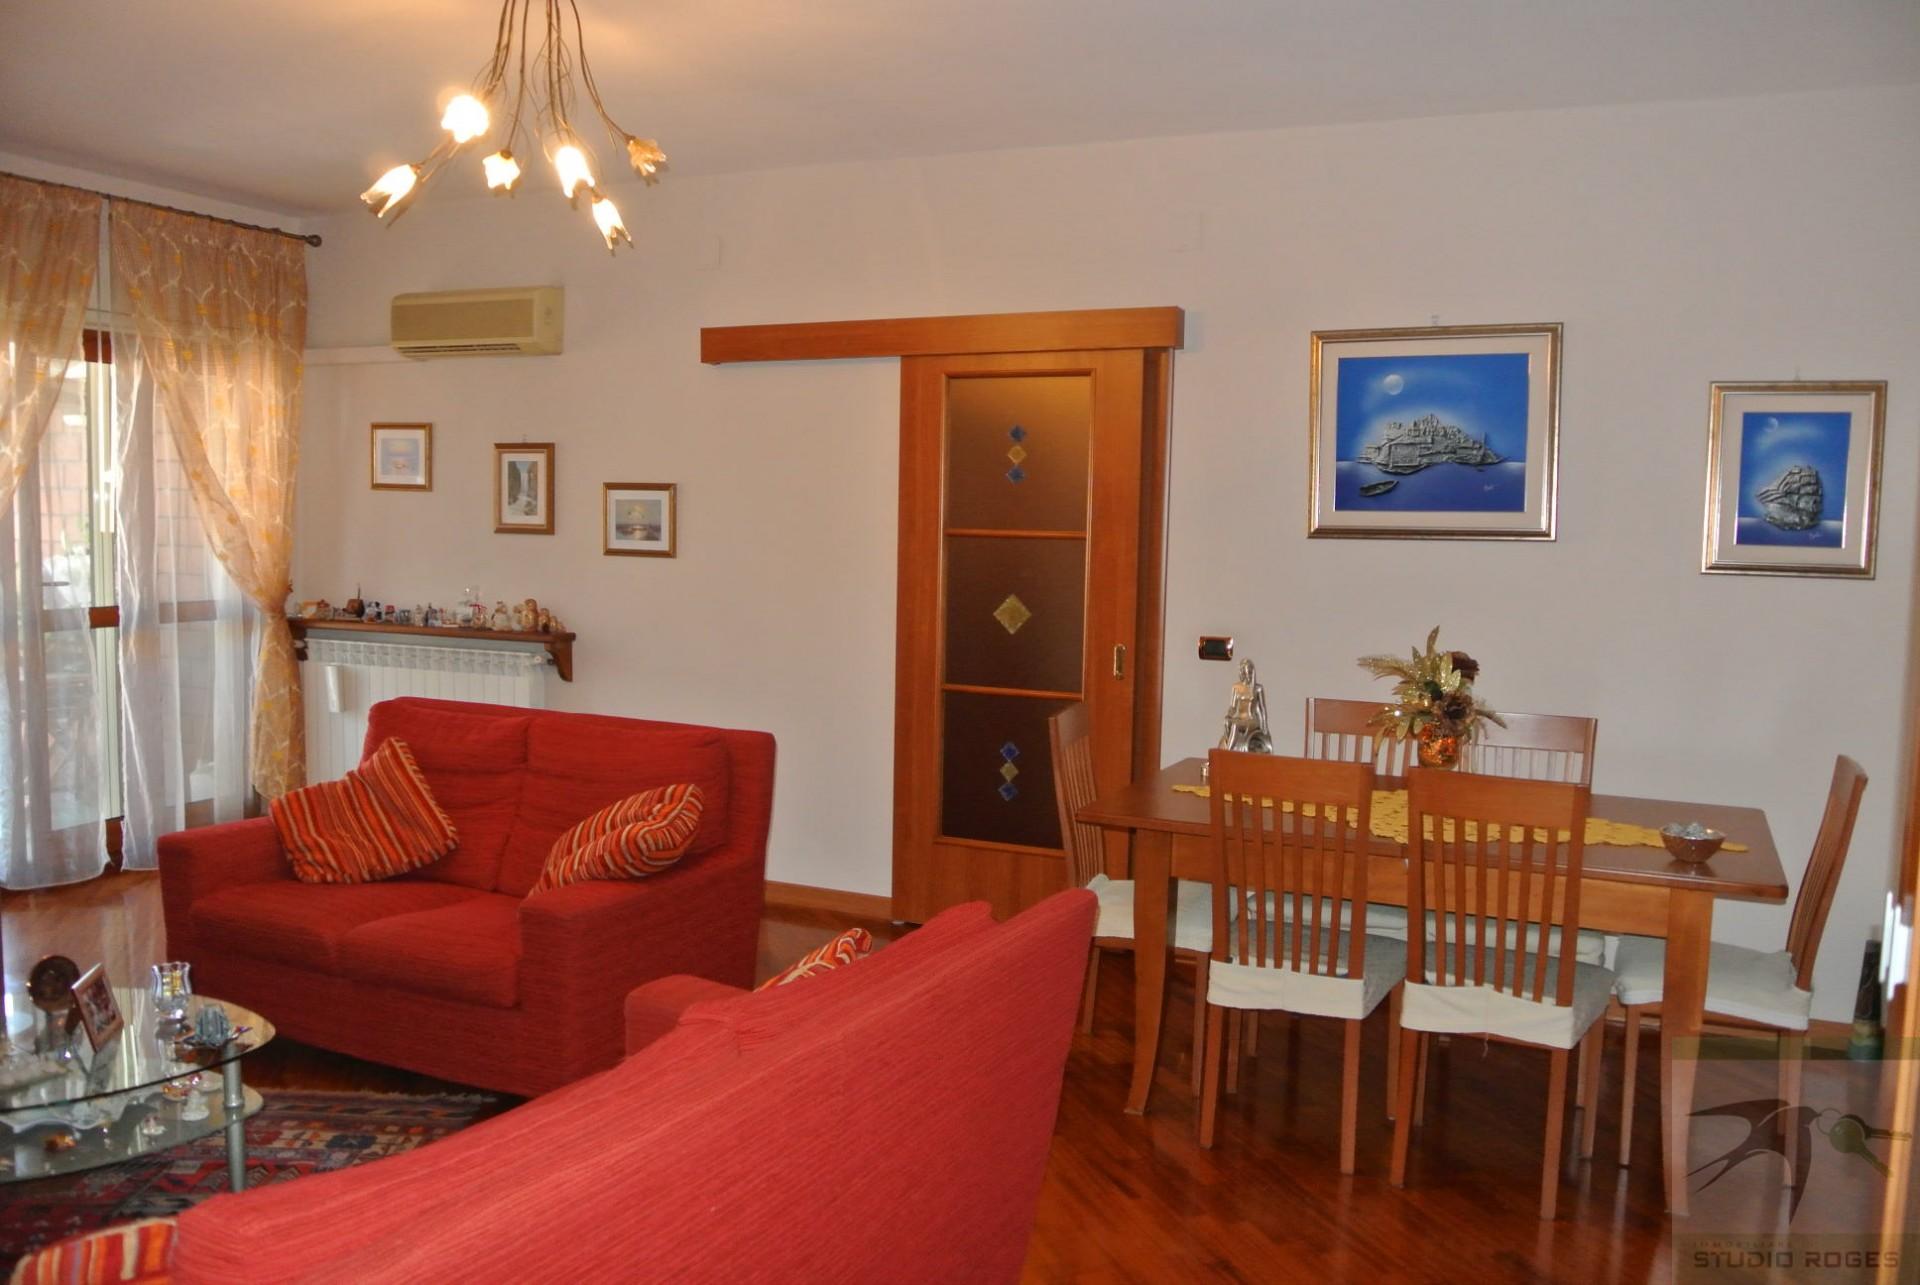 Appartamento in Vendita 82,92 mq - N. camere: 3 - - Rende - Roges-Commenda (CS)